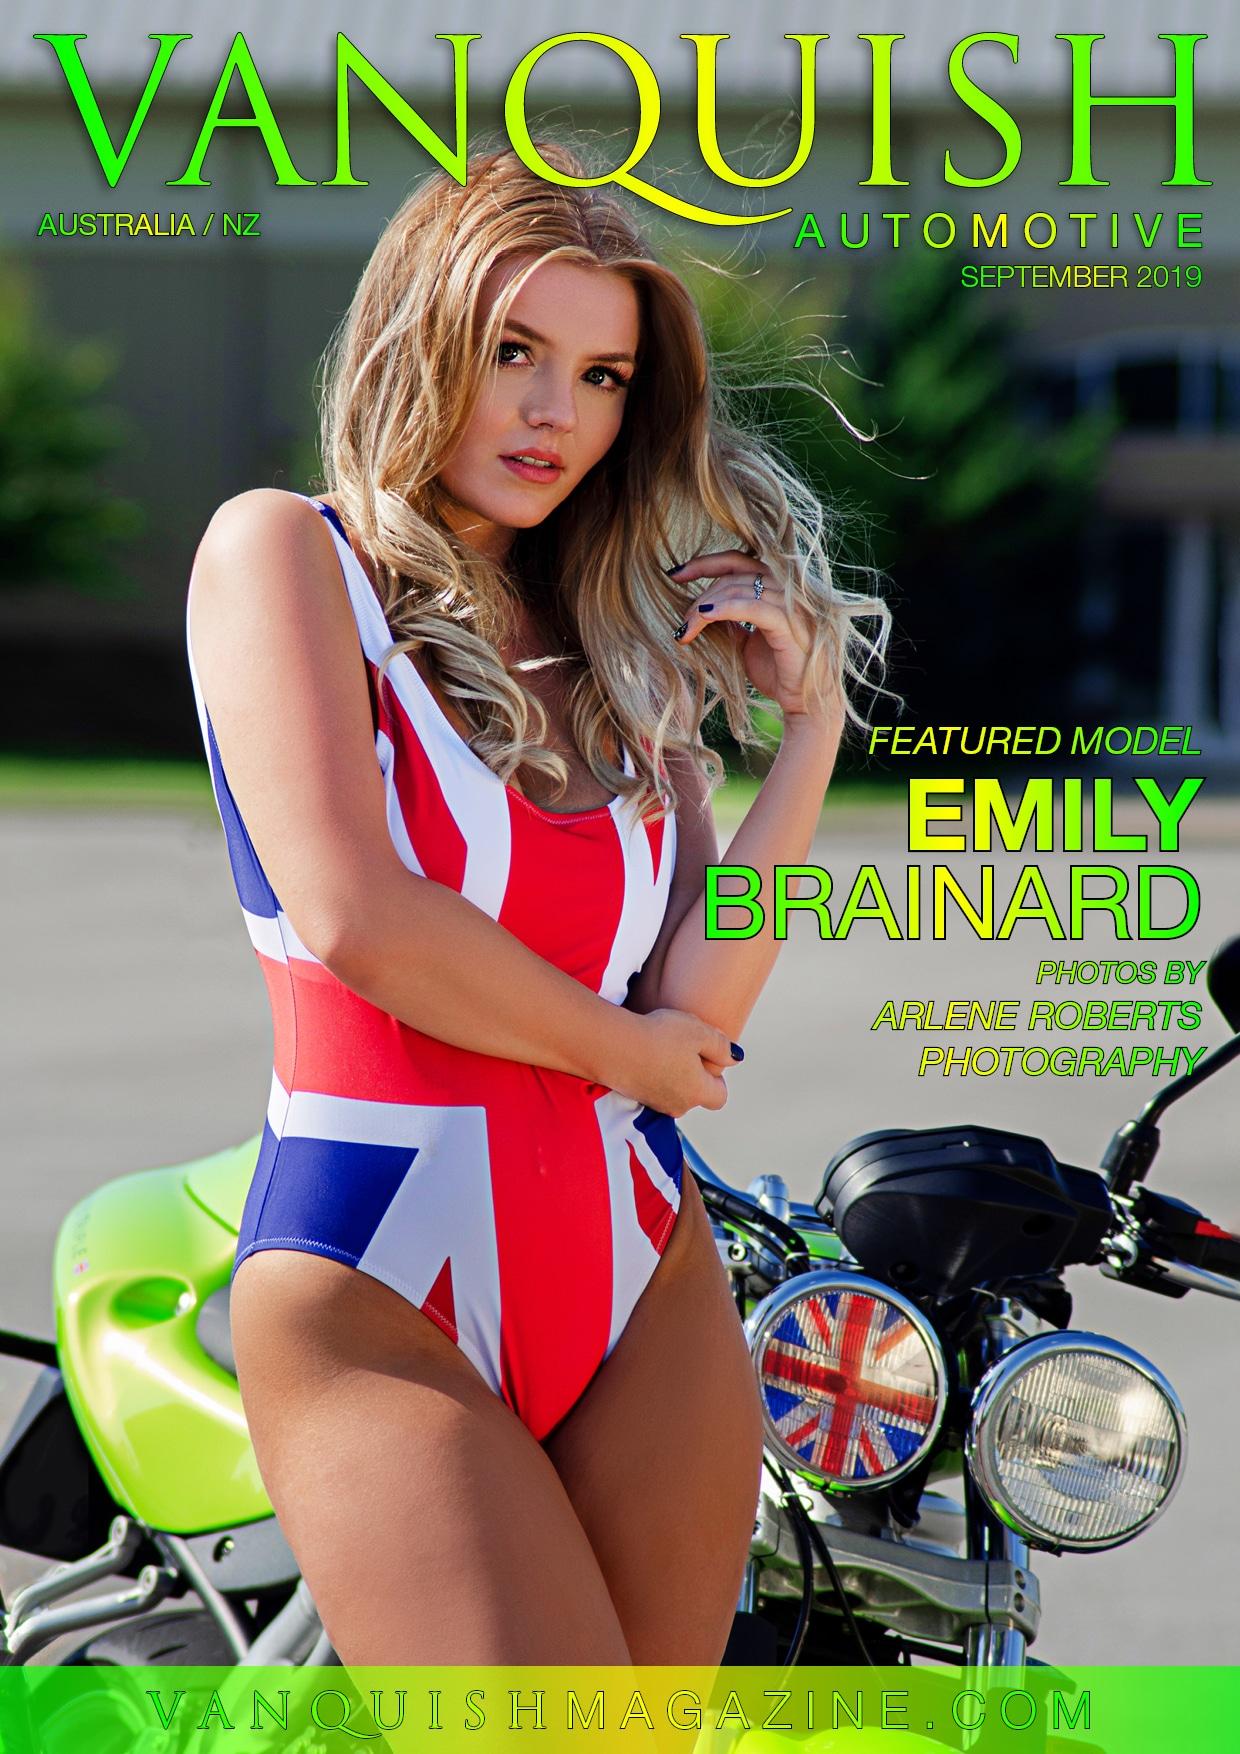 Vanquish Automotive – September 2019 – Emily Brainard